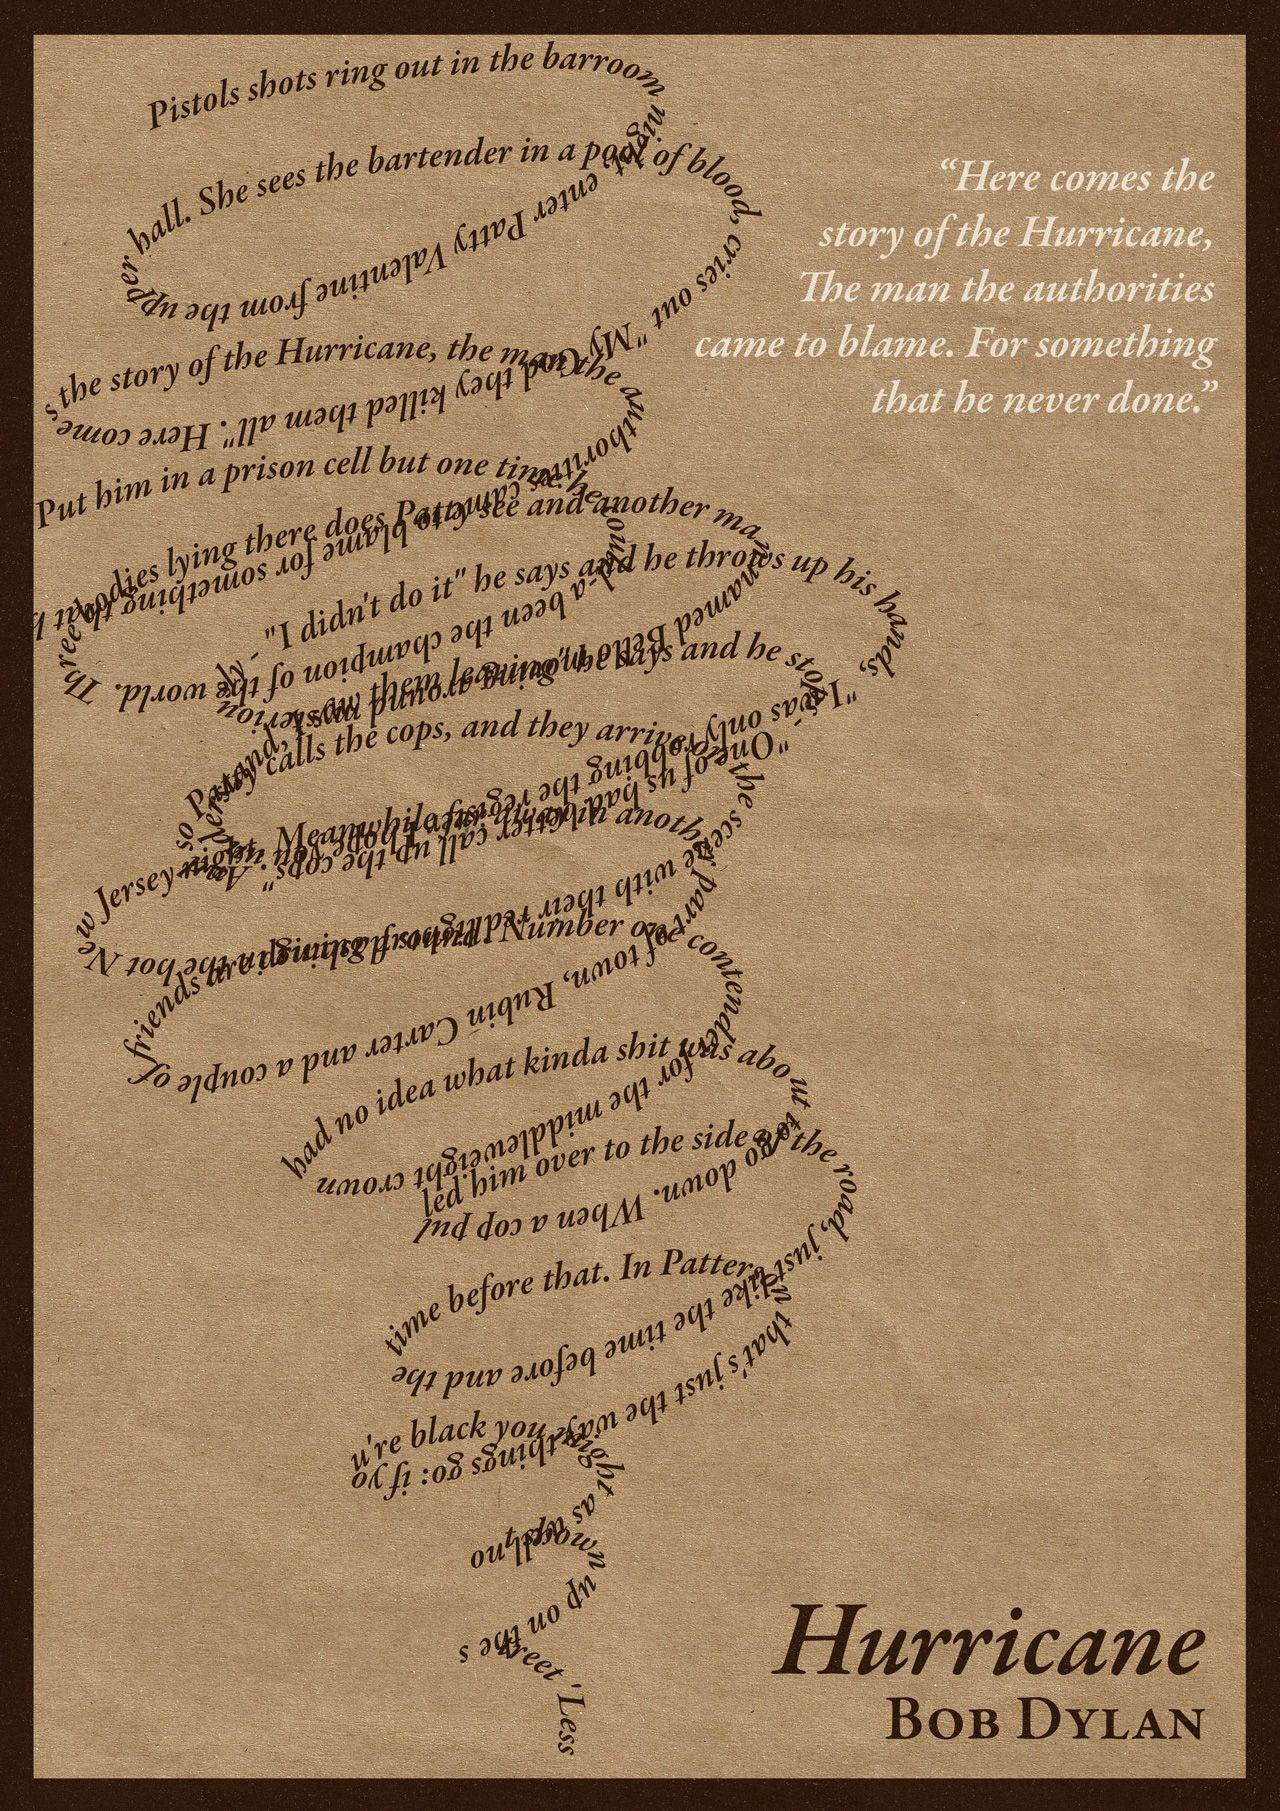 Pin By Cie Cefeg On Lyrics Hurricane Bob Dylan Bob Dylan Quotes Bob Dylan